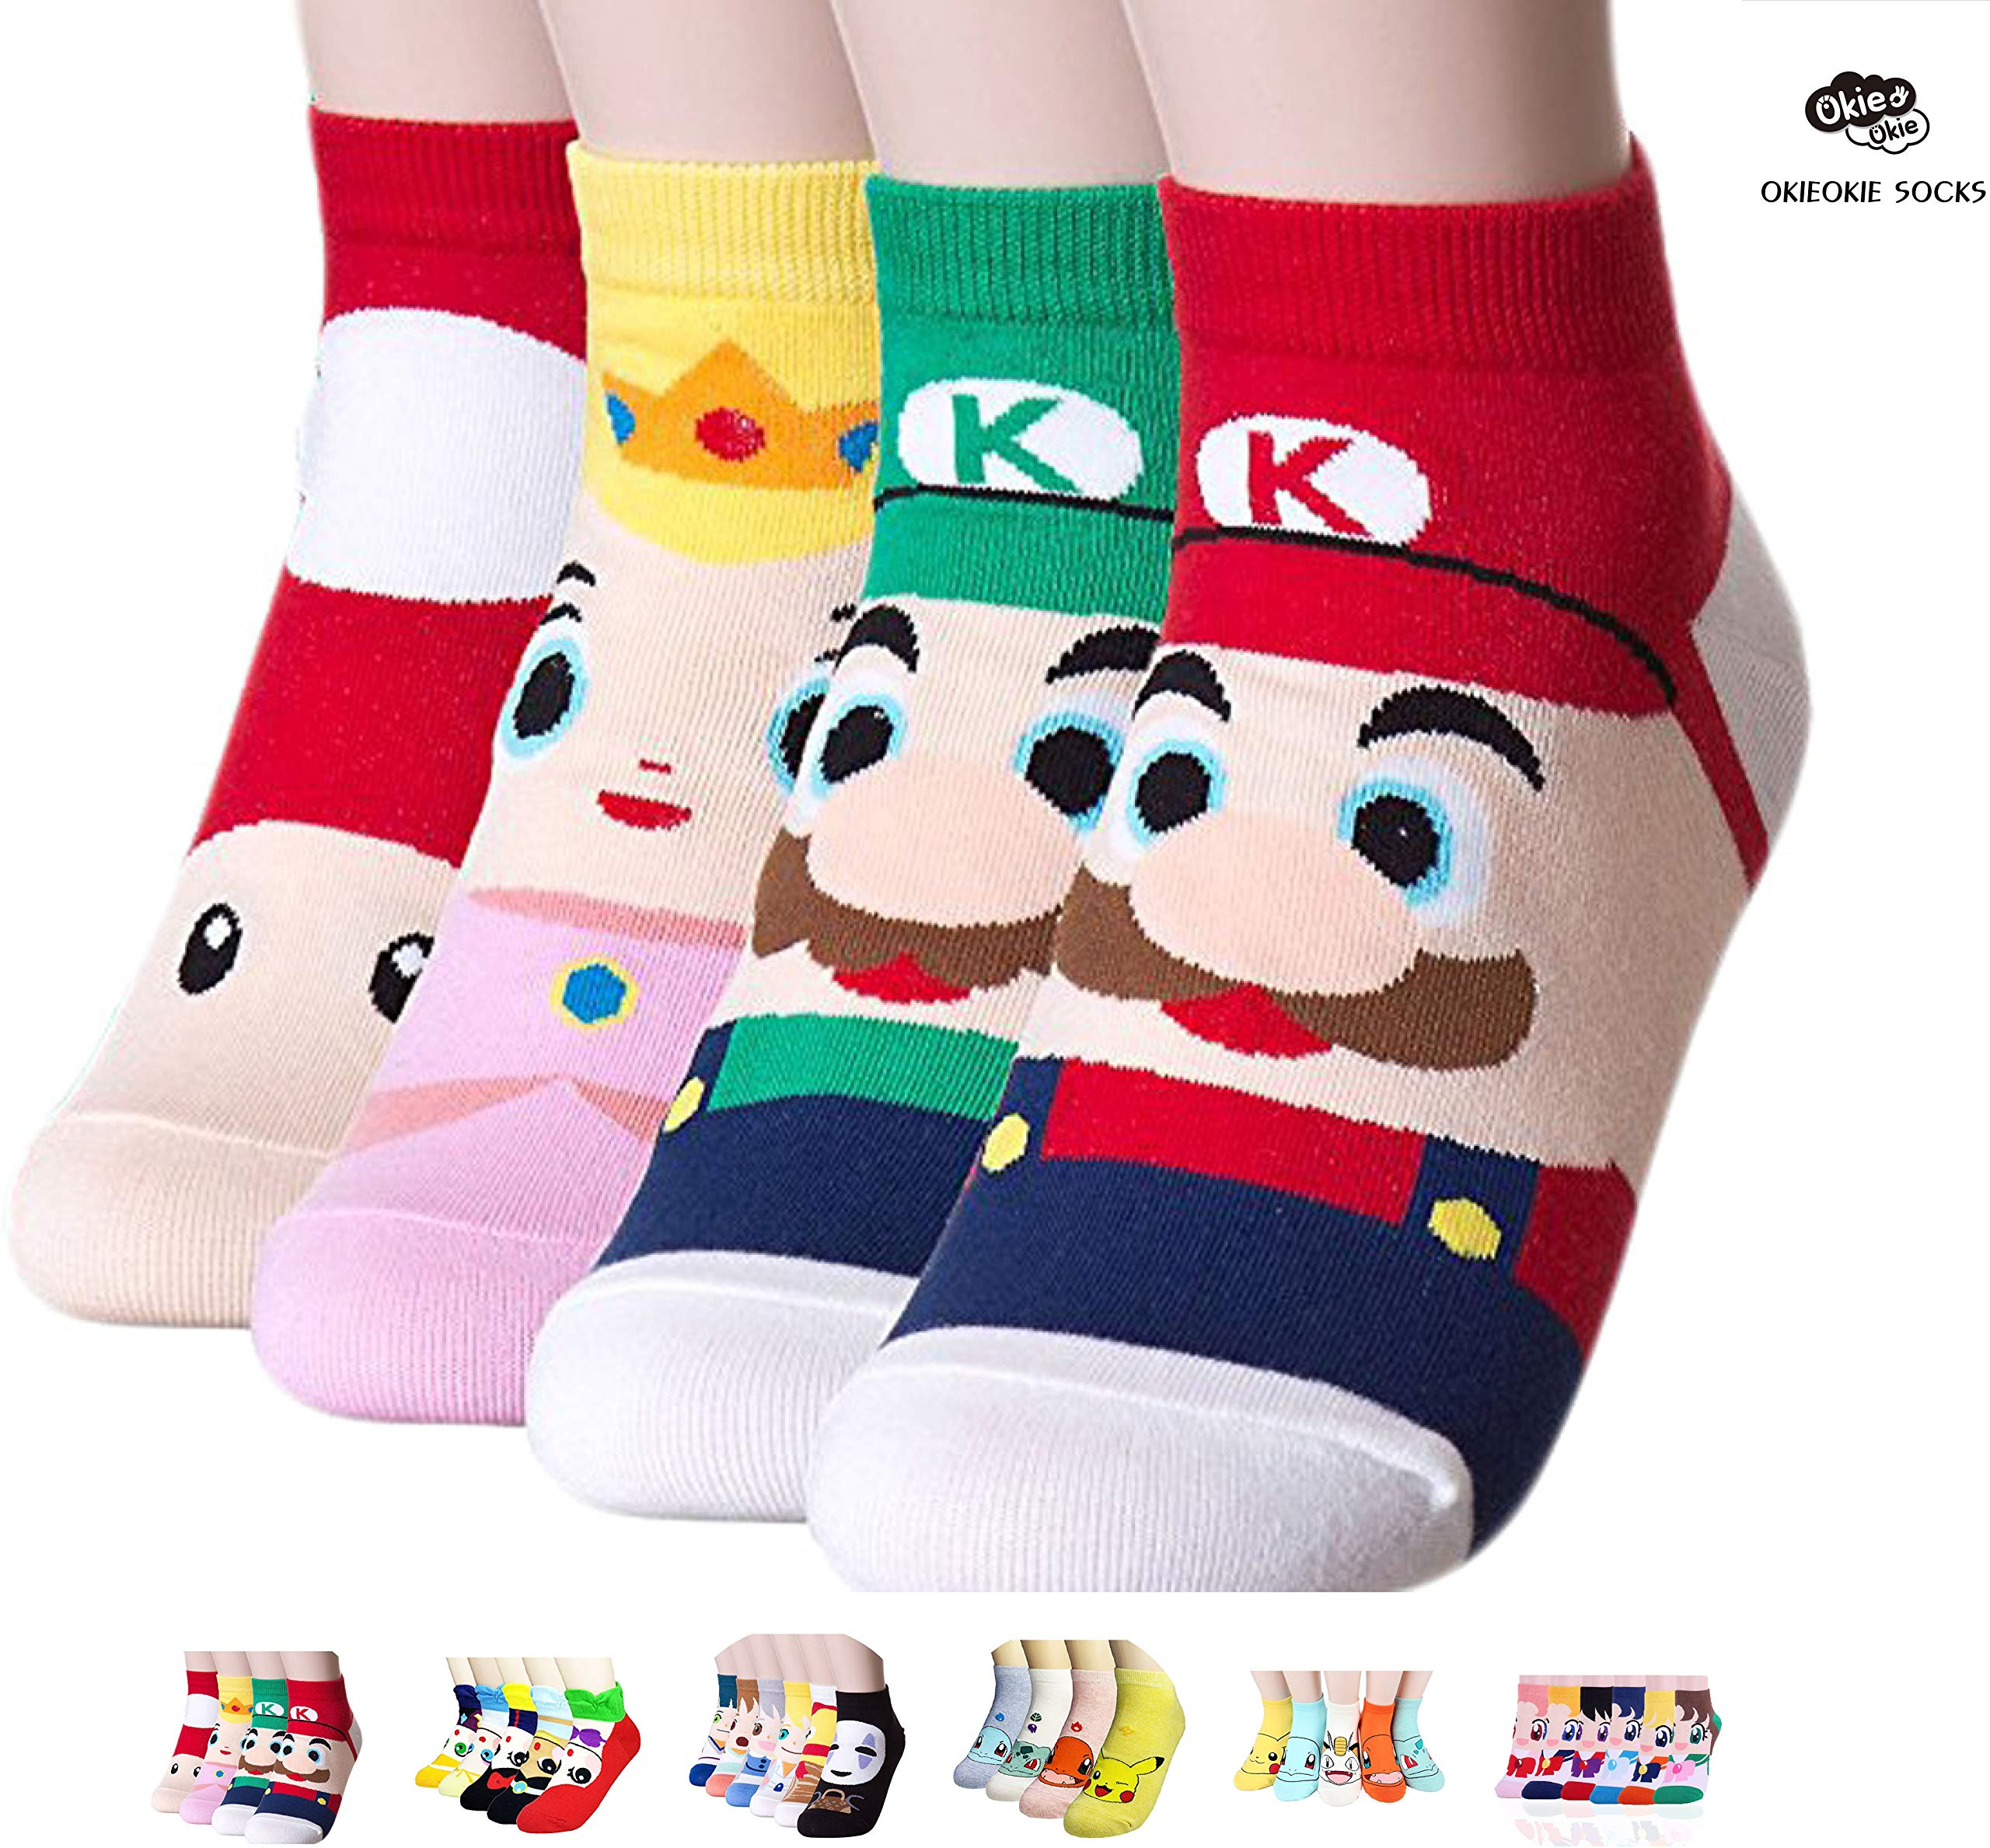 Womens Christmas Gifts.Okie Okie Best Selling Womens Socks Gift Animal Cat Dog